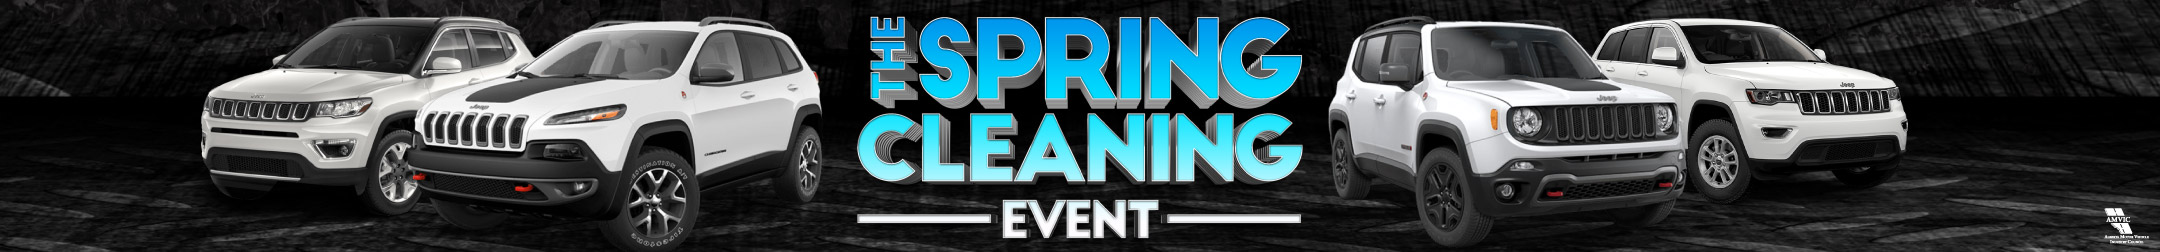 SpringCleaning_WebAssets_BUILD_DAG_DodgeLPHeader.jpg